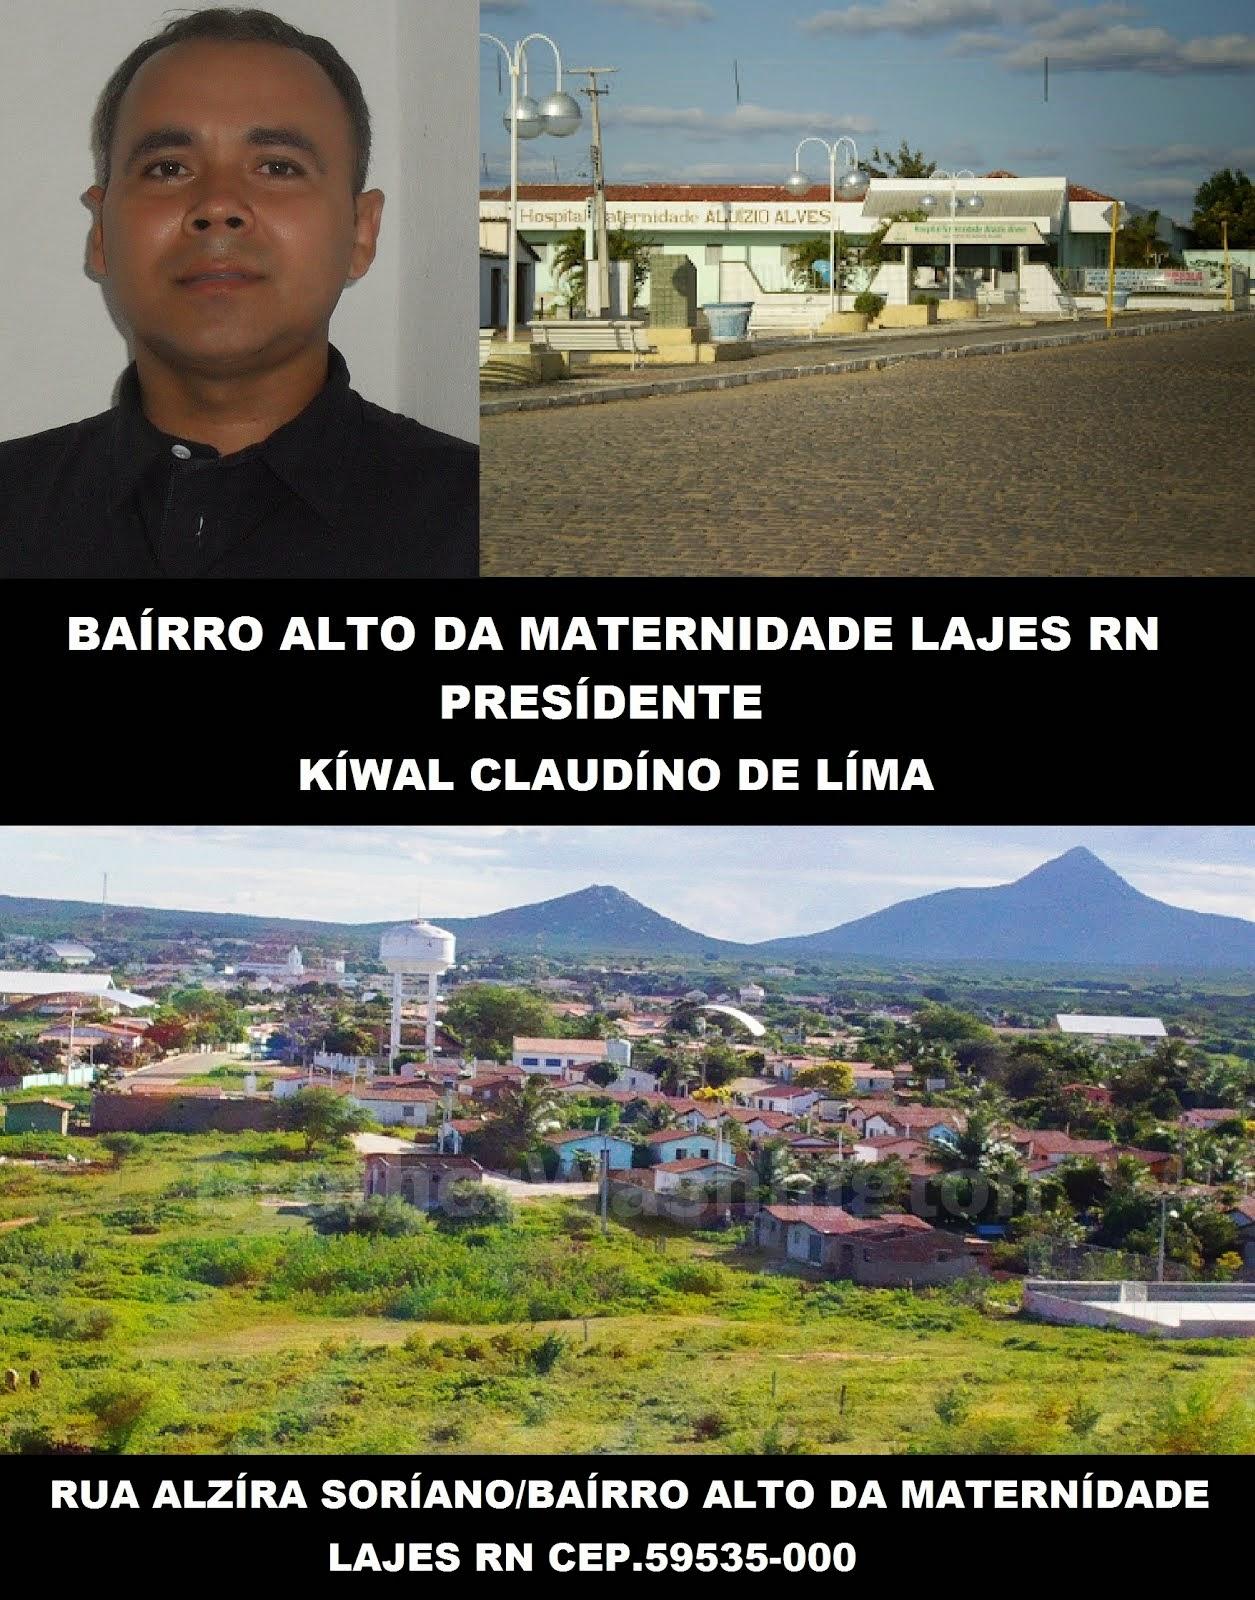 BAIRRO ALTO DA MATERNIDADE LAJES RN